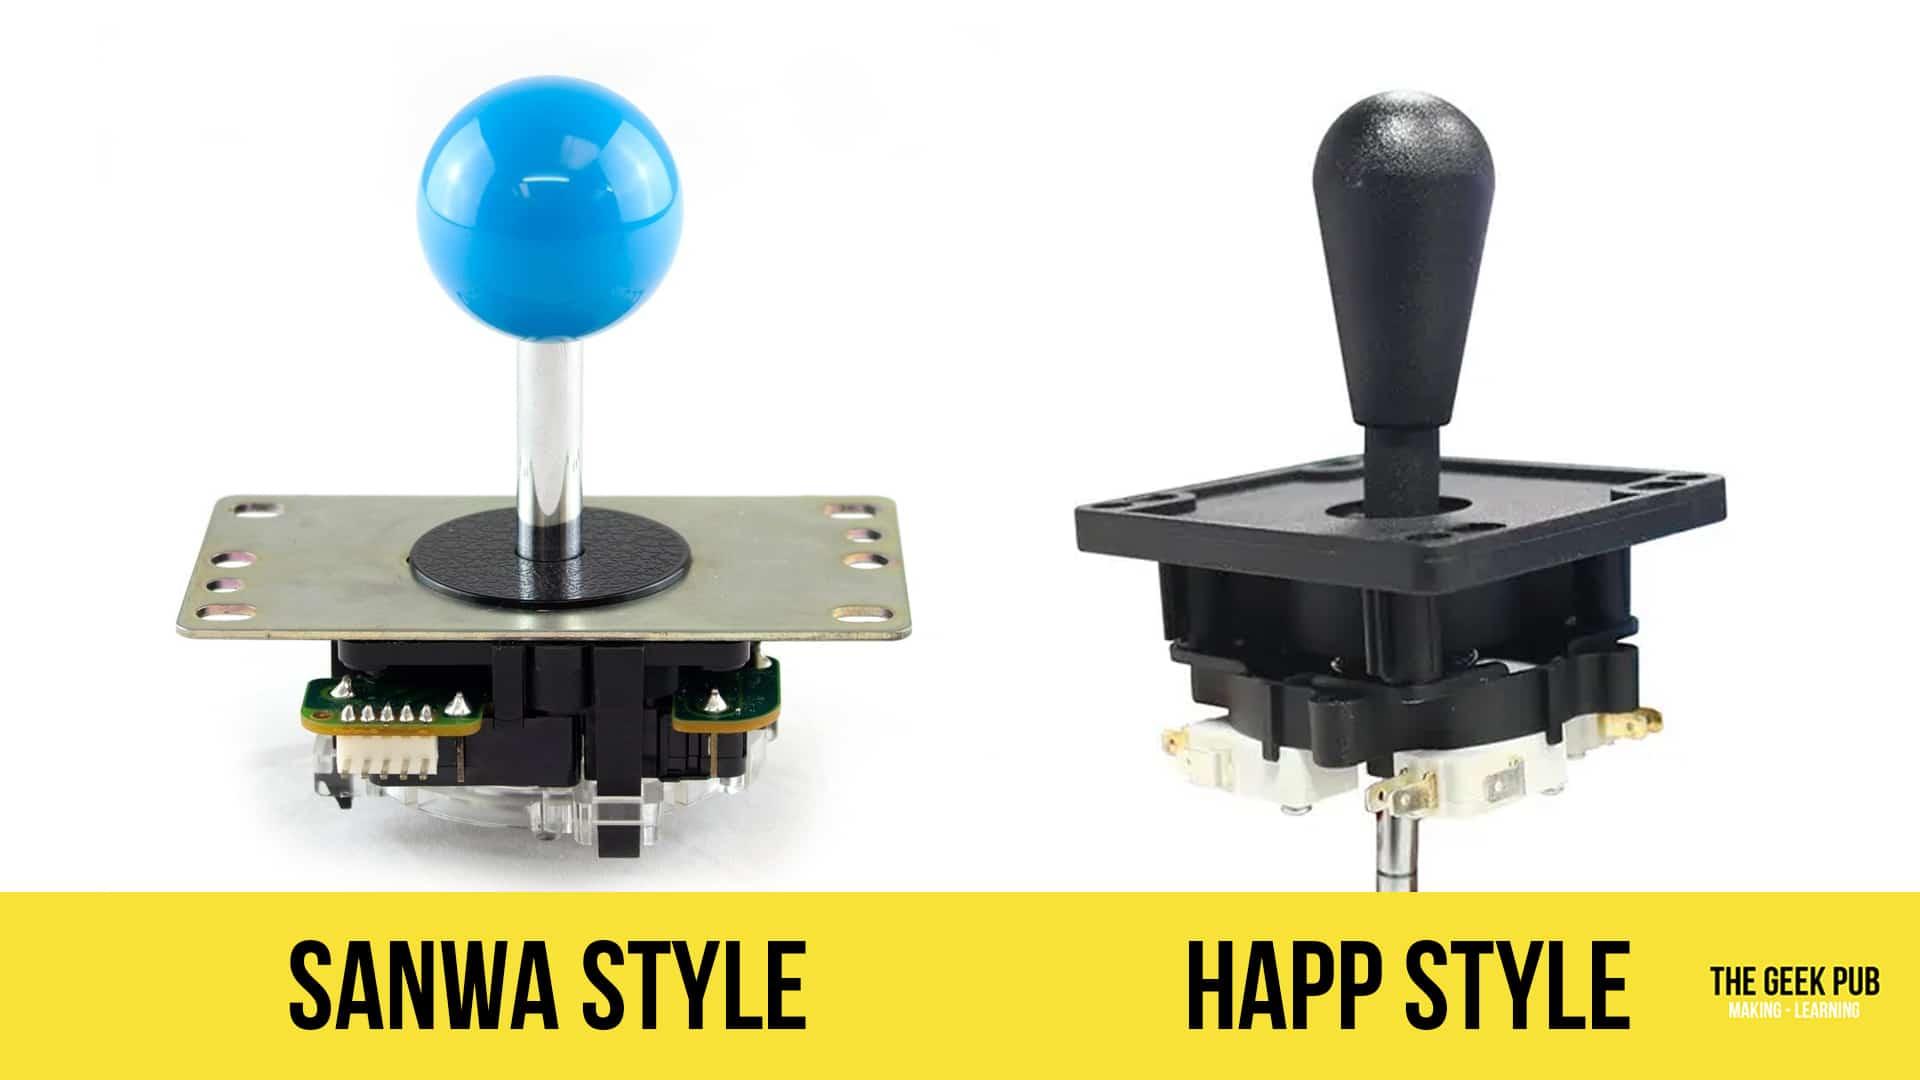 Sanwa vs Happ: The Best Arcade Joysticks